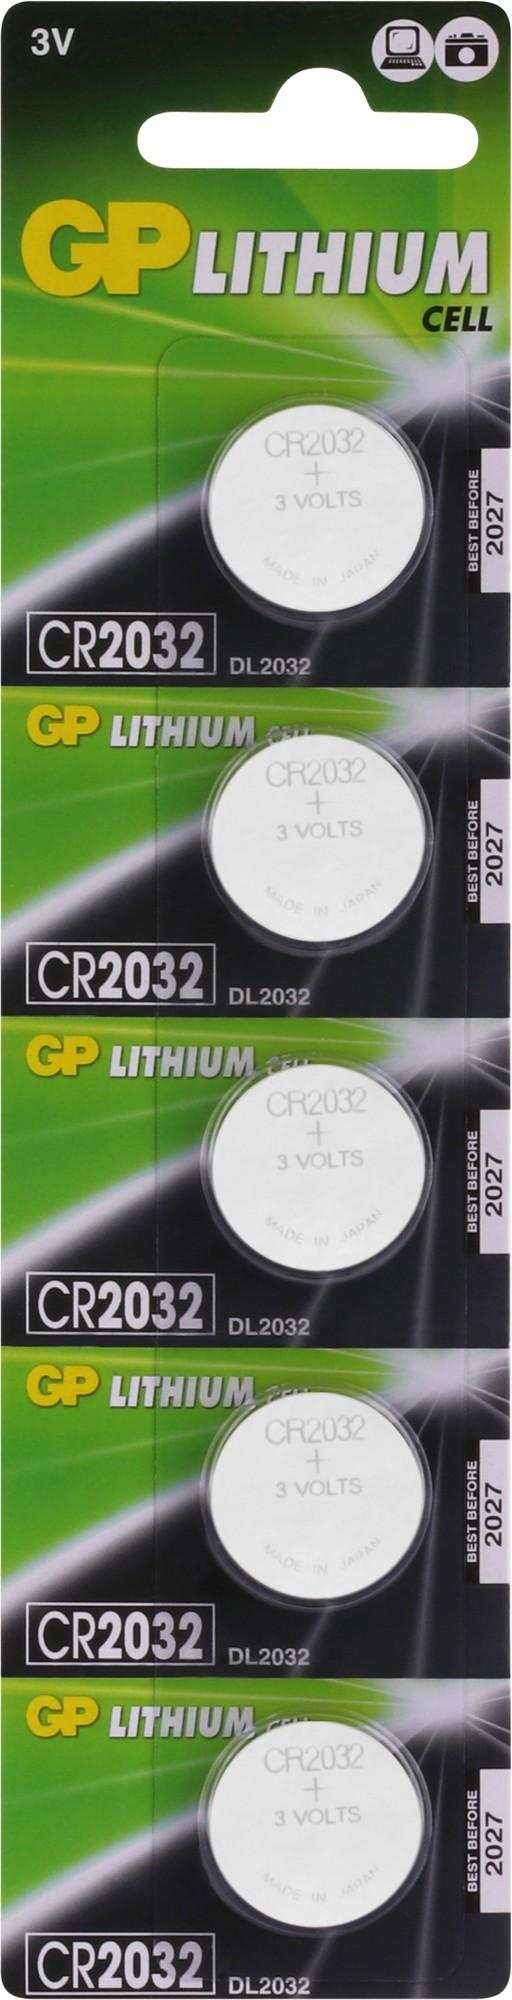 GP Lithium knoopcel CR2032, blister 5x1 (parrot mki)